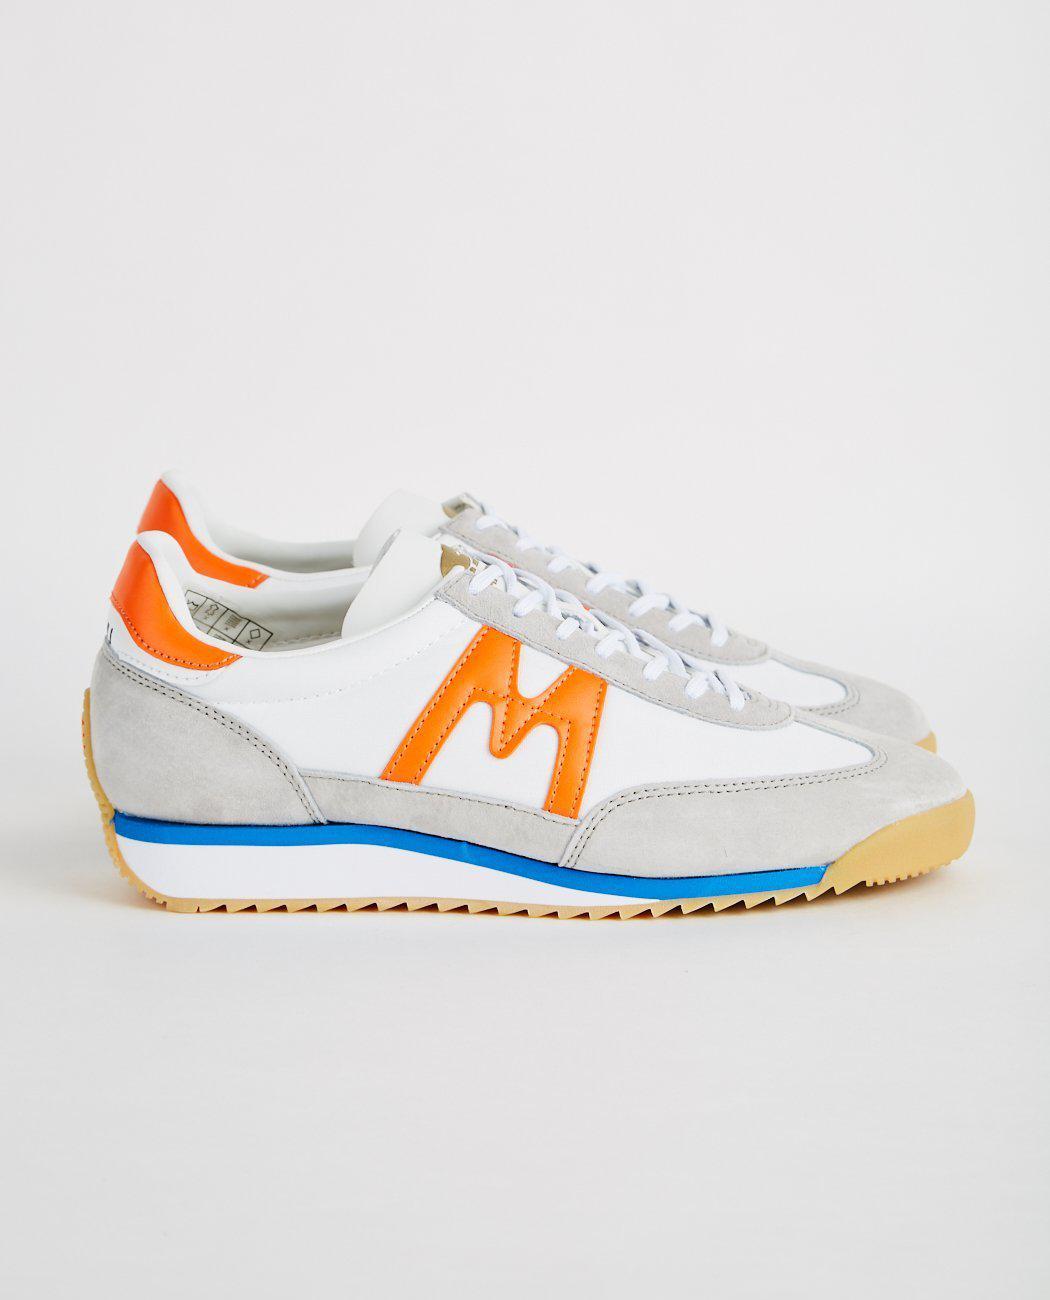 Karhu Championair sneakers shopping online cheap price mJJzFjPj4e